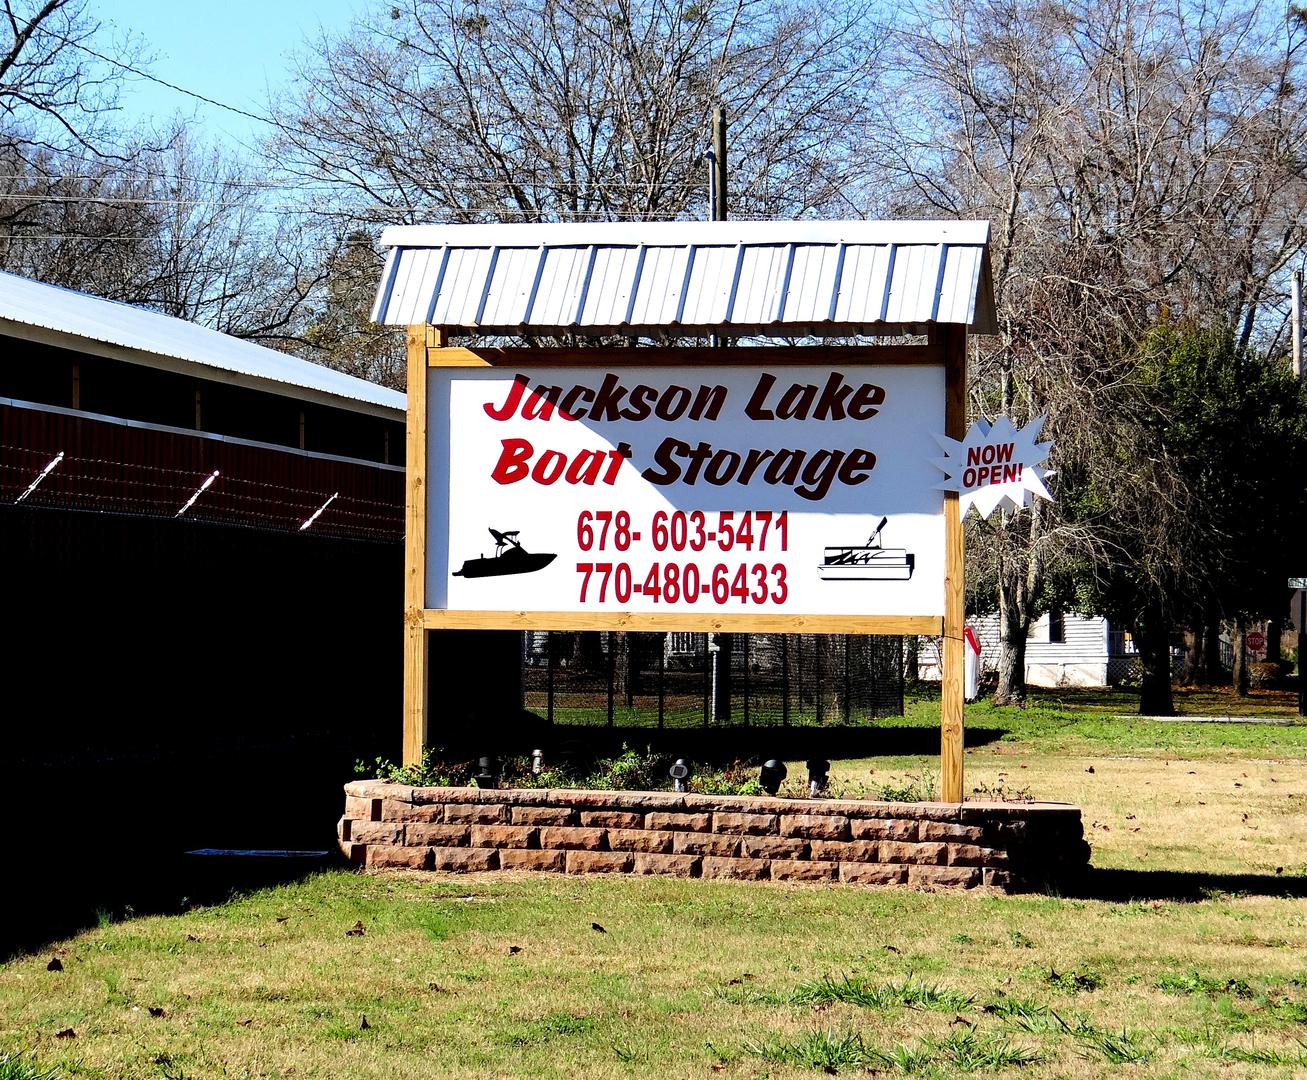 Jackson Lake Boat Storage